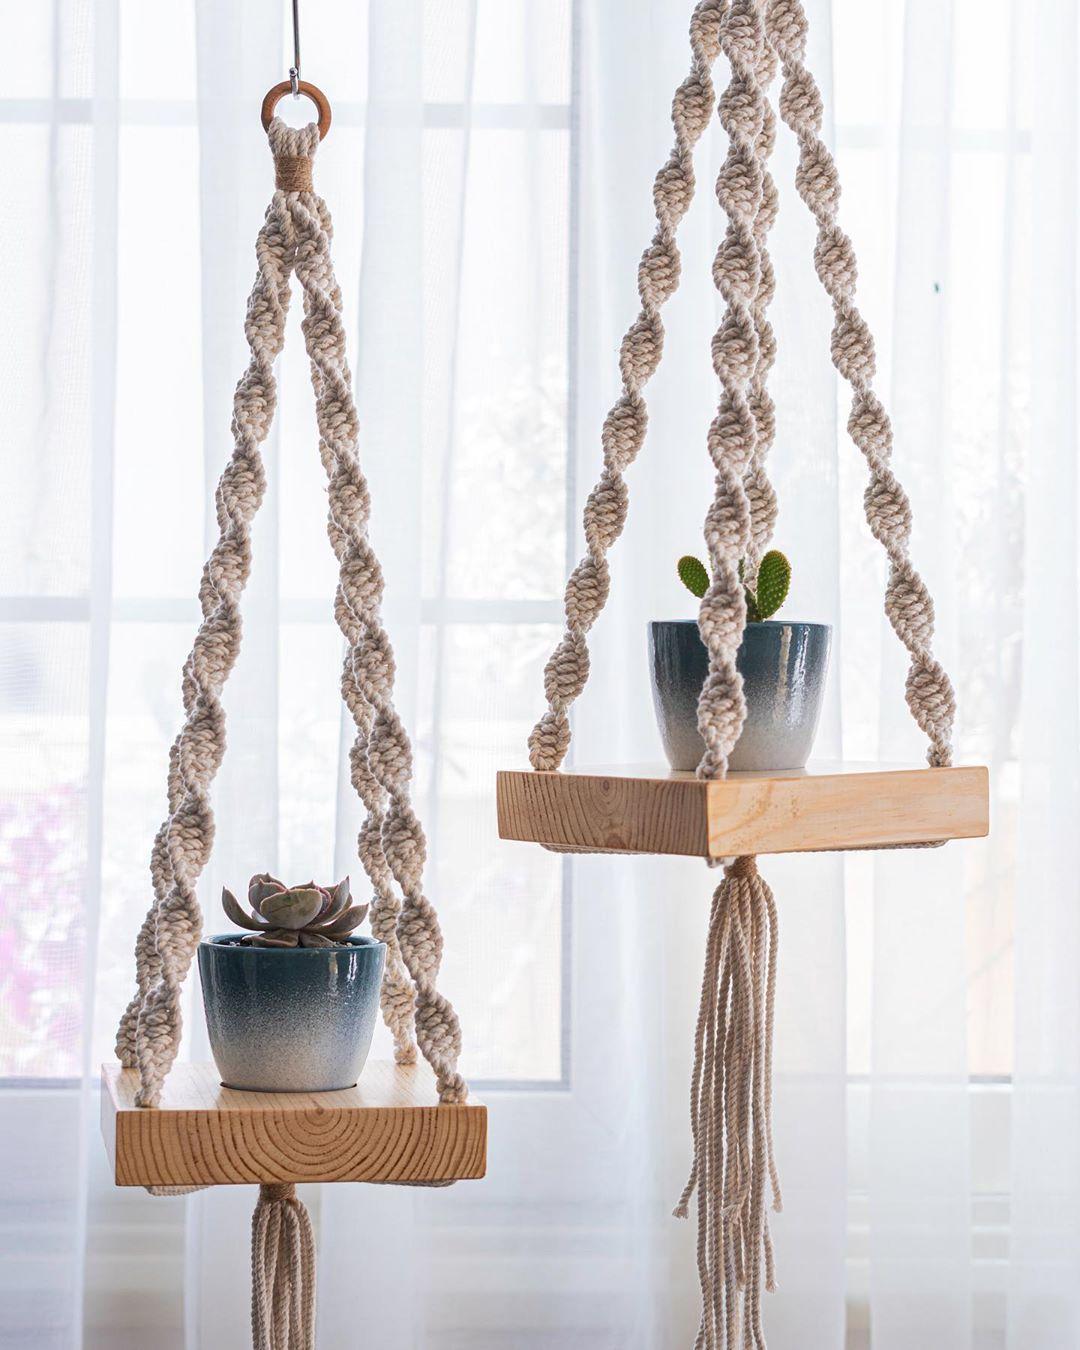 Hanging Wooden Shelf Macrame + Plant